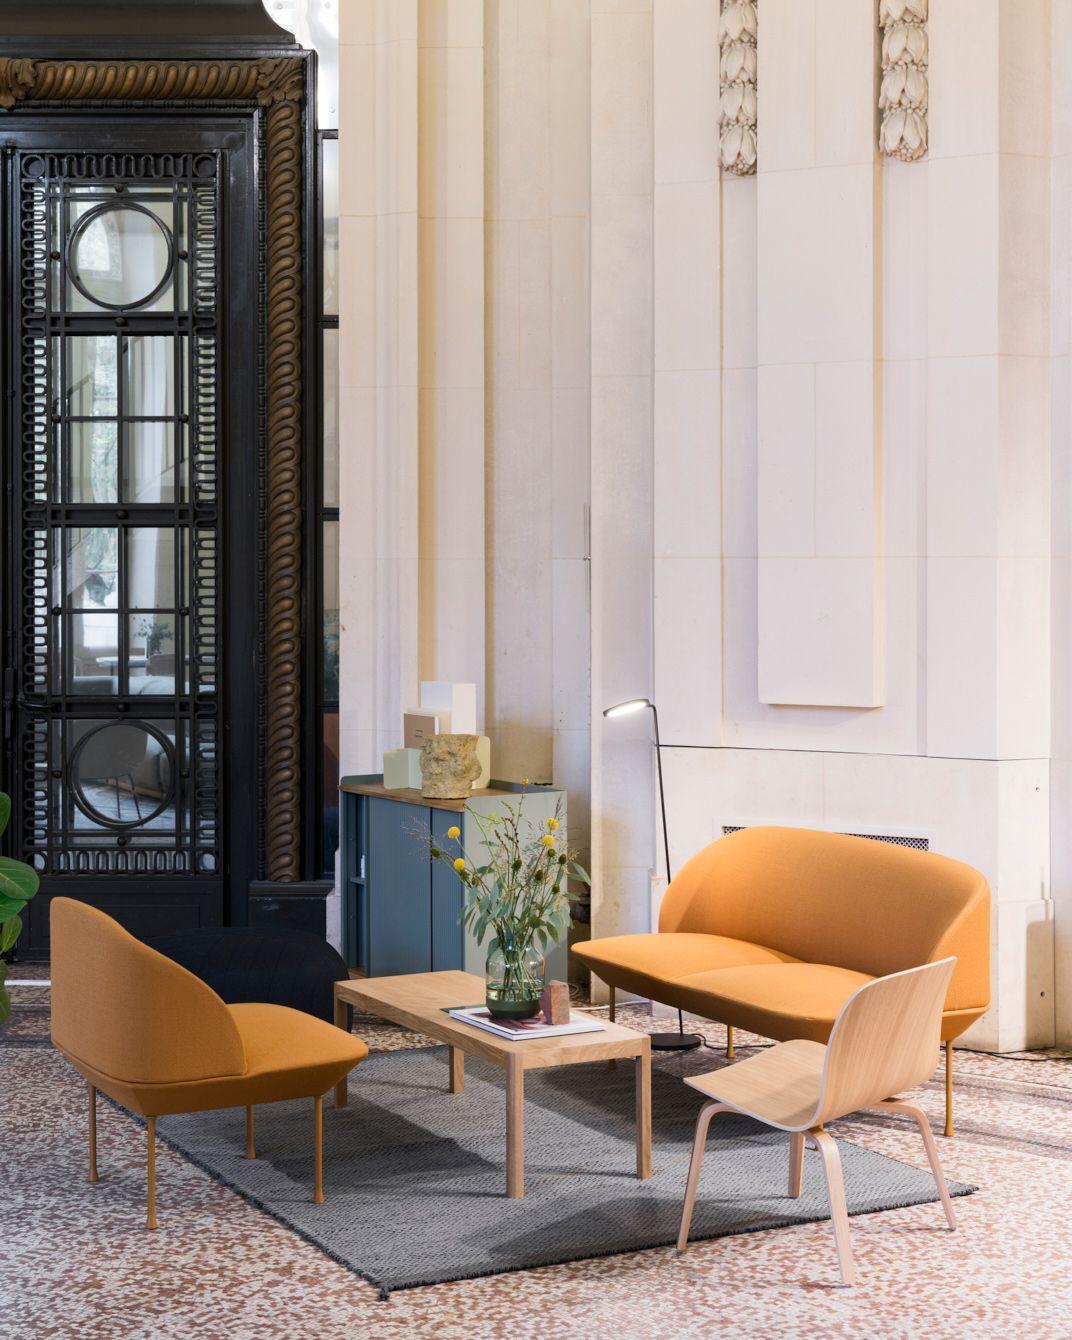 Scandinavian Sofa Inspiration From Muuto The Oslo Sofa Family Unites Geometric Li Living Room Scandinavian Lounge Chairs Living Room Scandinavian Lounge Chair #scandinavian #living #room #chairs